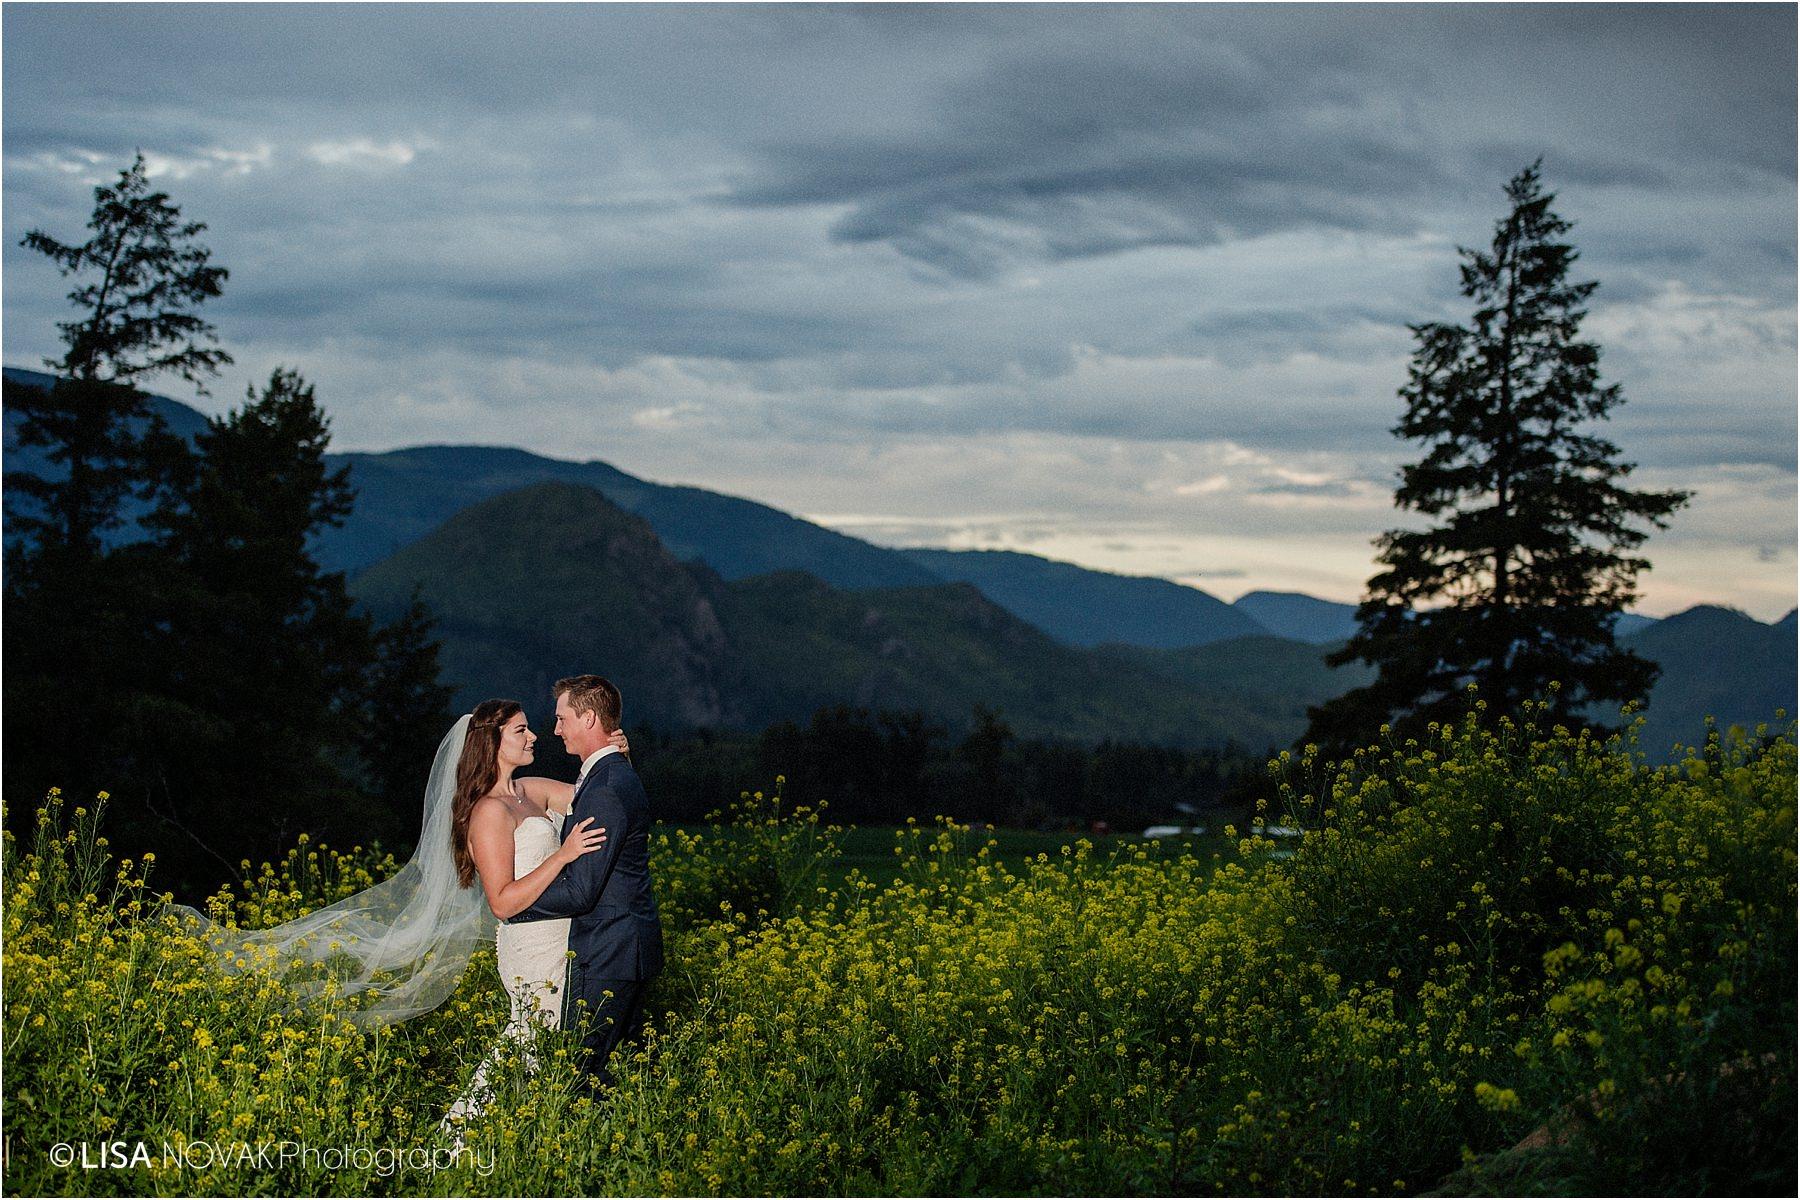 Kamloops wedding photographer night portrait off camera flash bride groom romantic bridal portraits portrait epic kiss